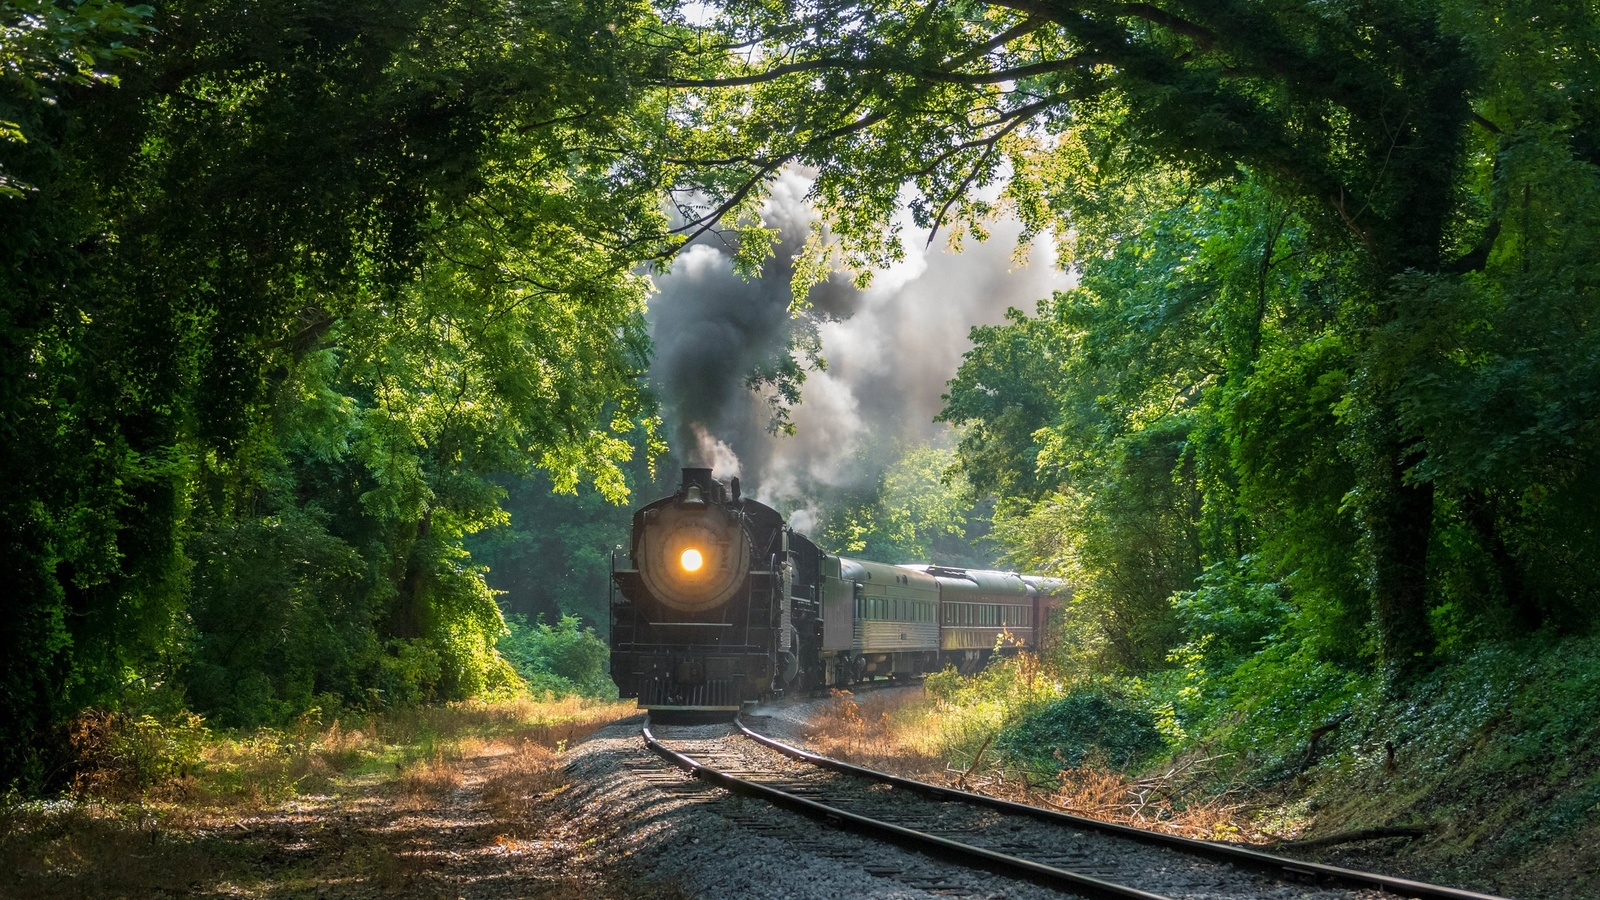 лес, железная дорога, поезд, паровоз, дым